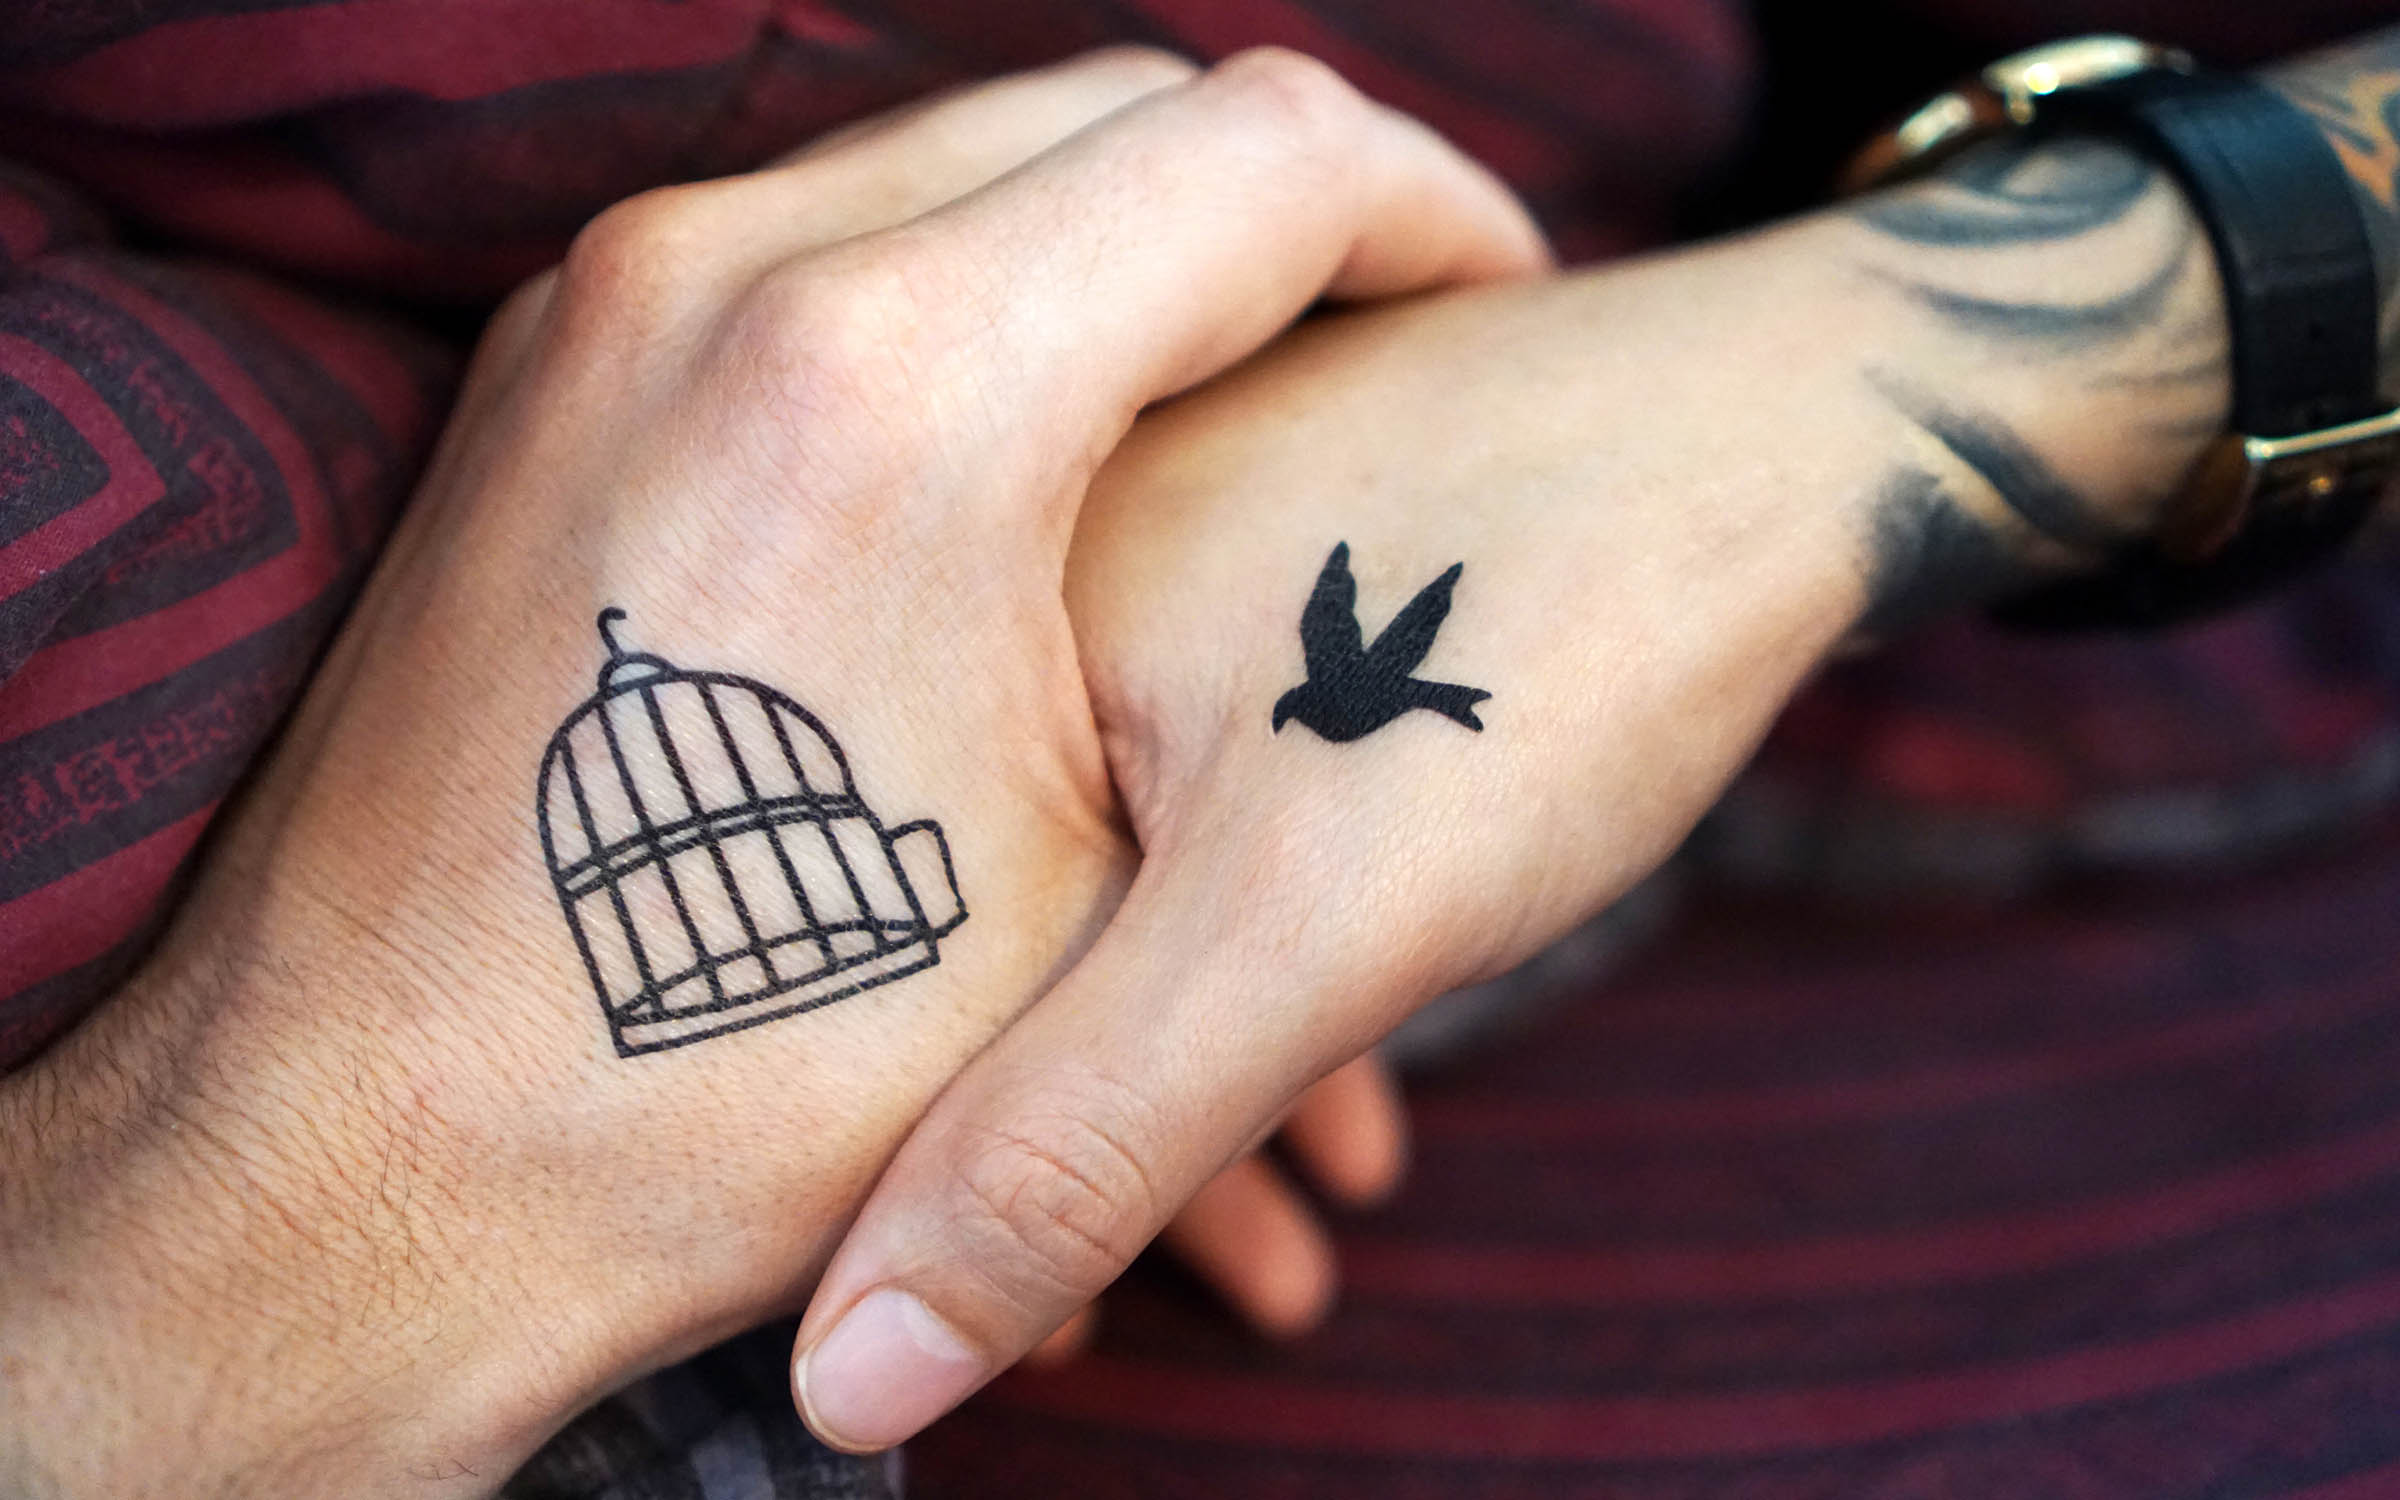 Tekenles, schilderen & tatoeage-kunst: